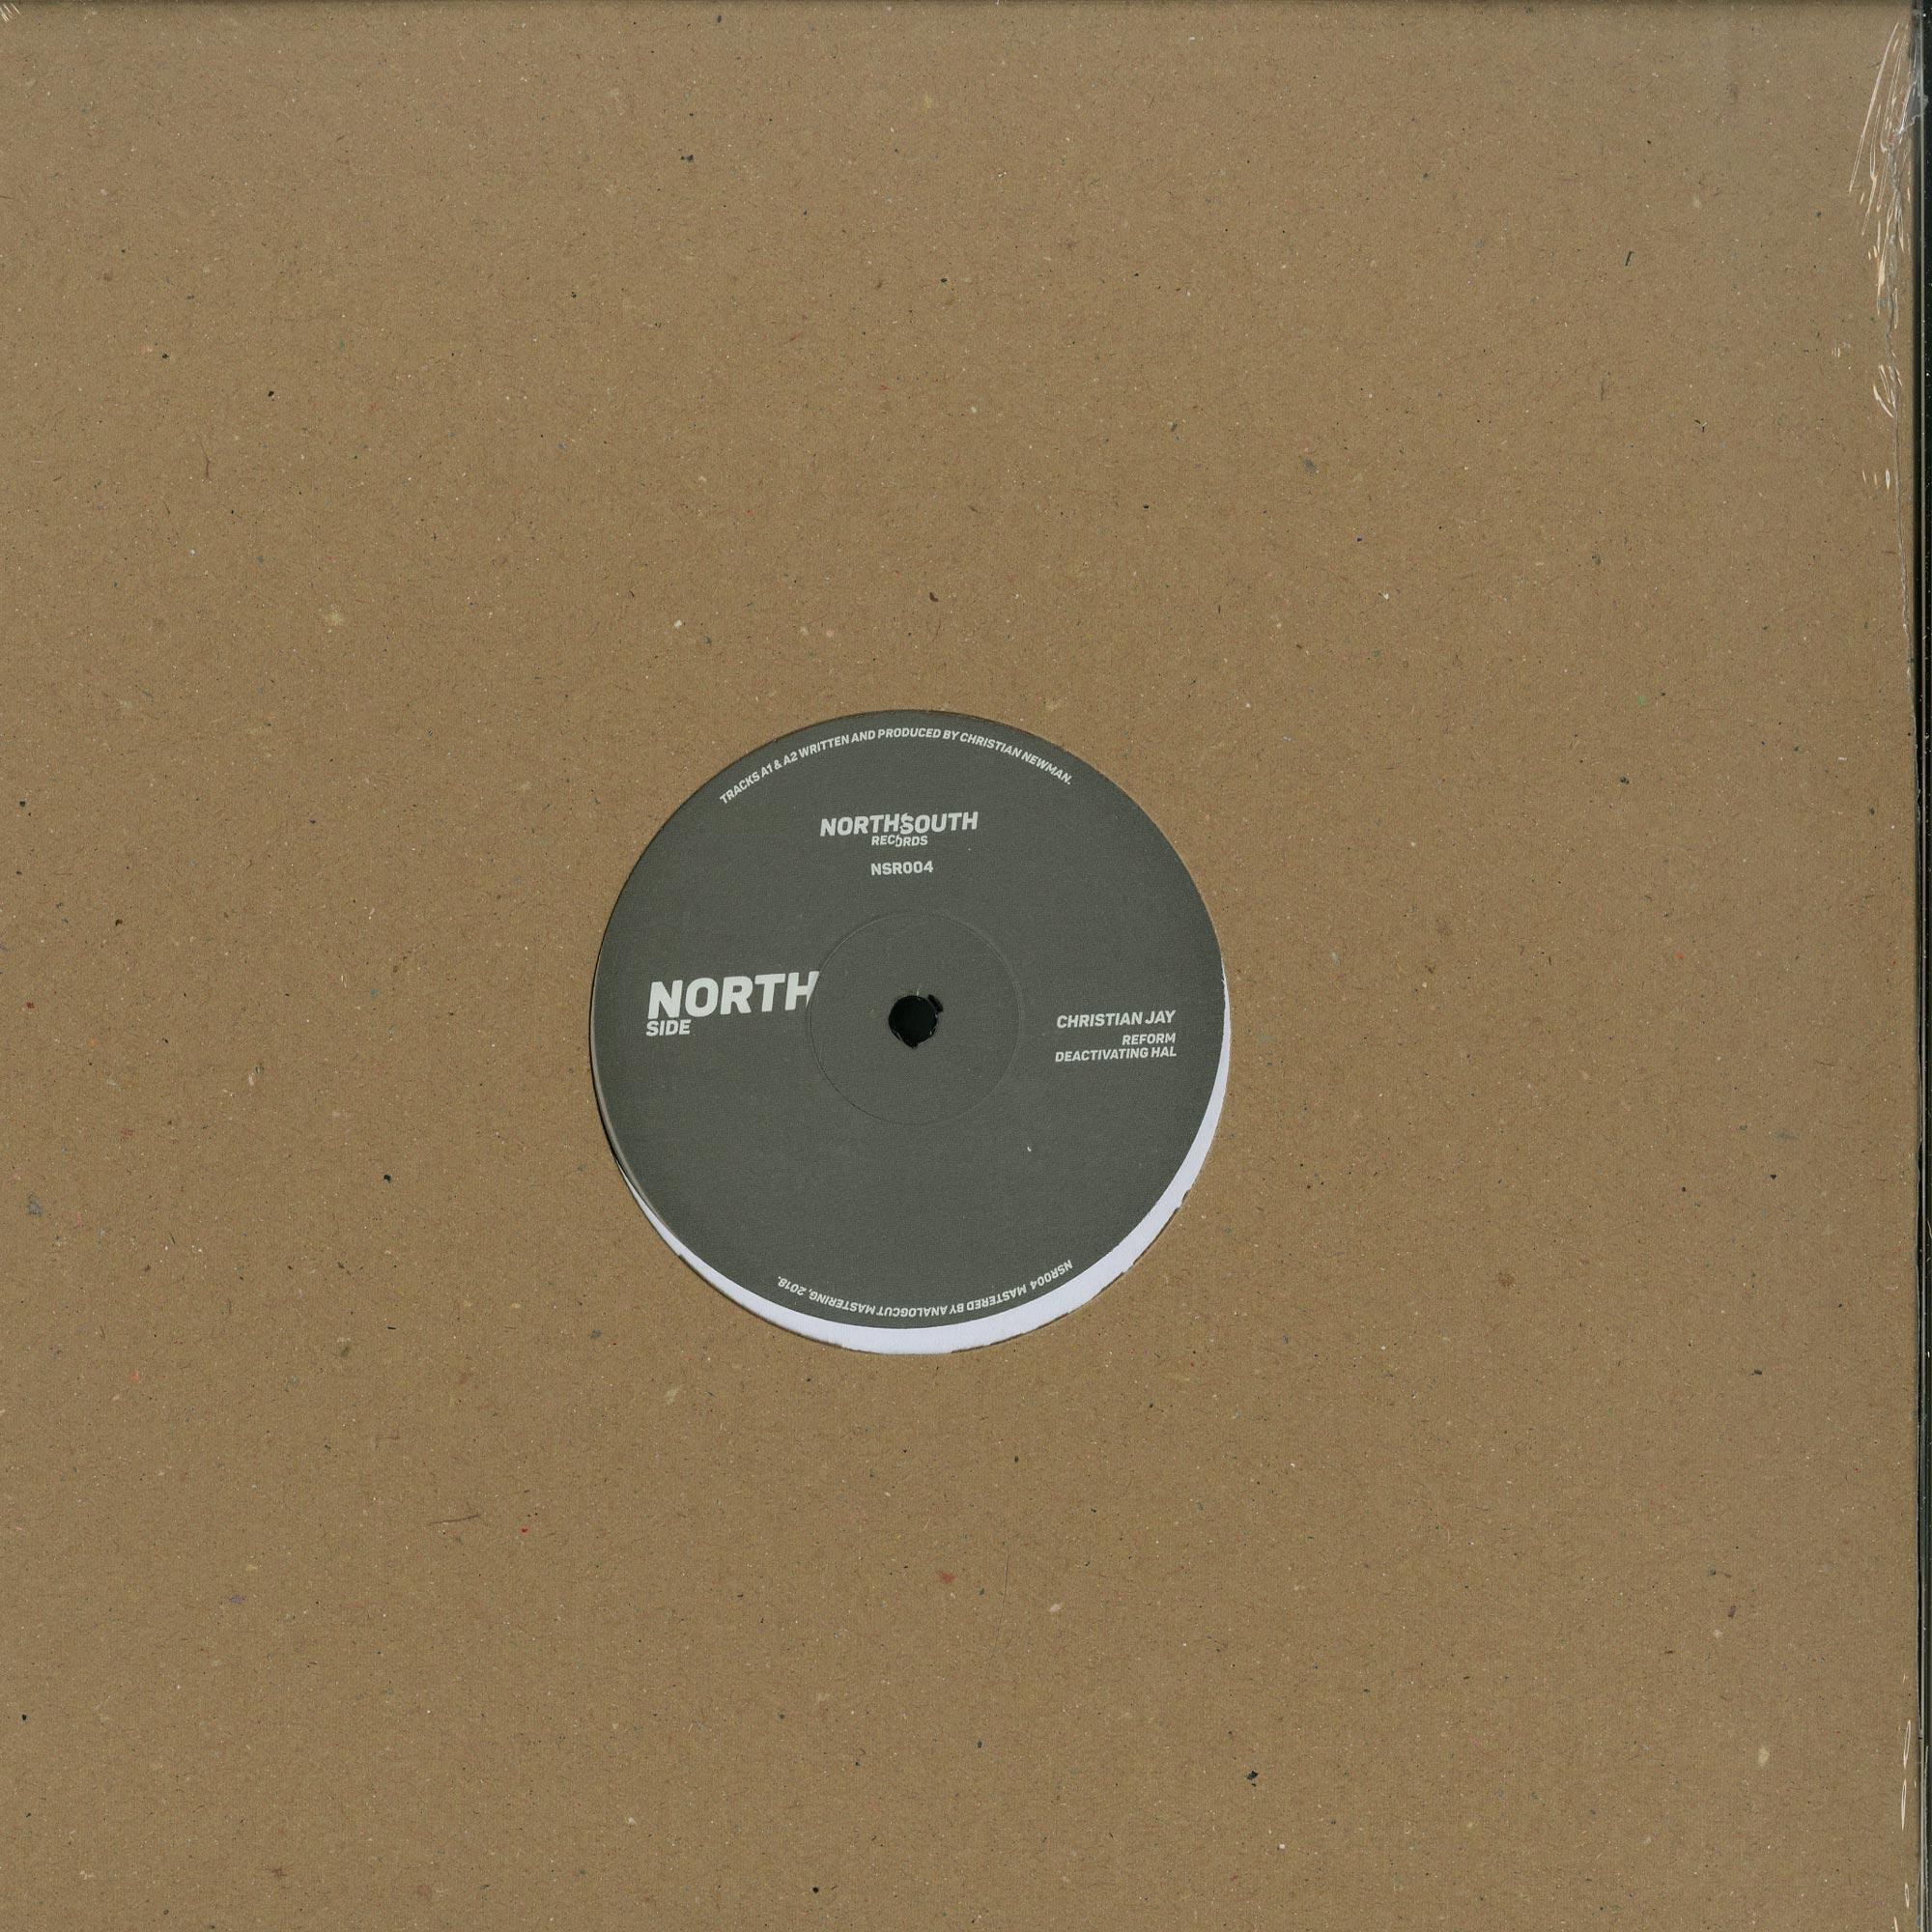 Christian Jay / Rob Amboule - NSR 004